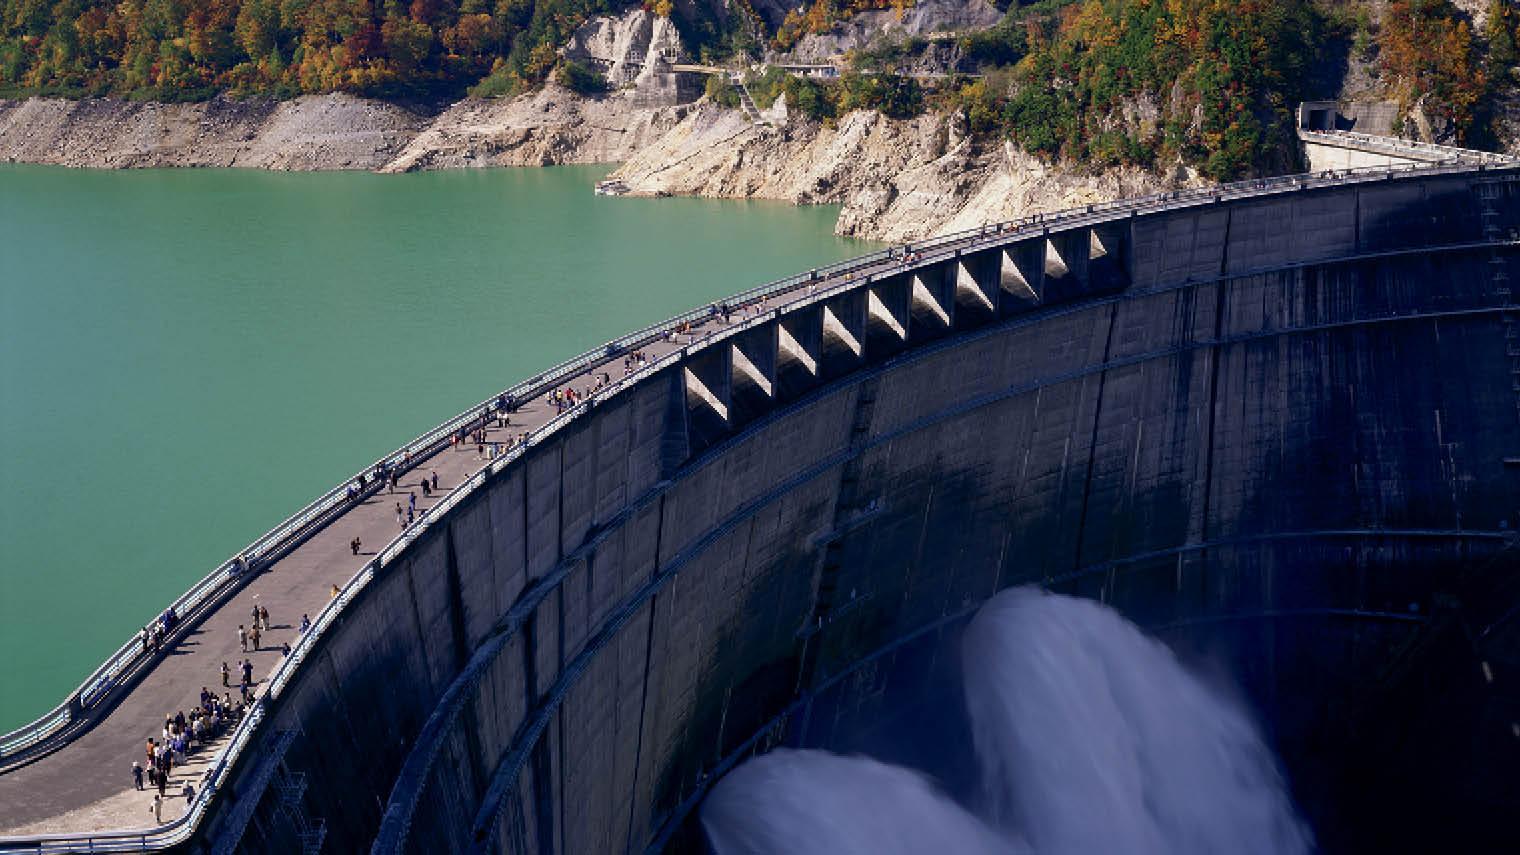 Three Gorges Hydropower Plant, China